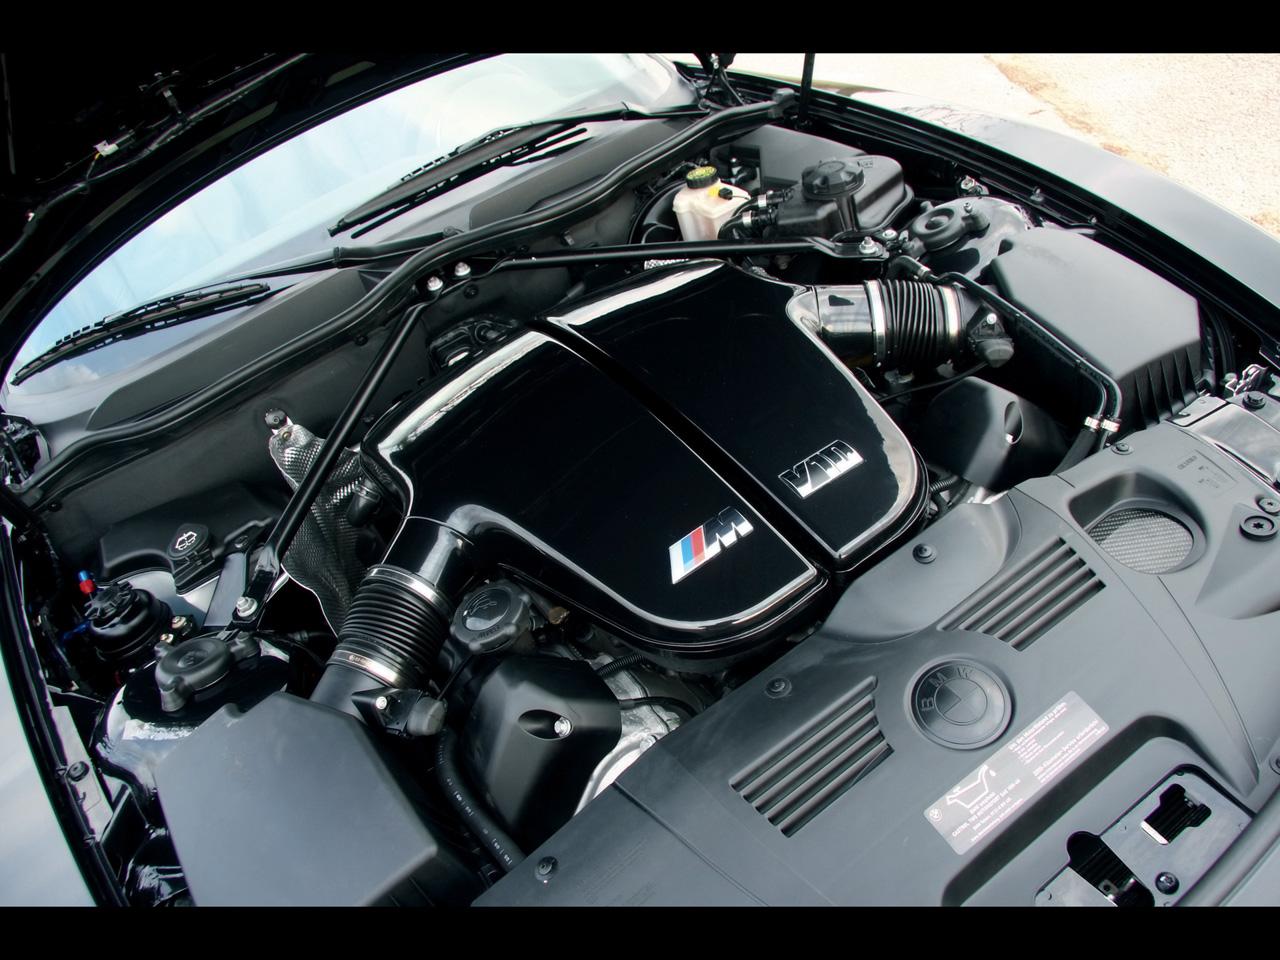 2010-Manhart-Racing-BMW-Z4-V10-Engine-Compartment-1280x960.jpg